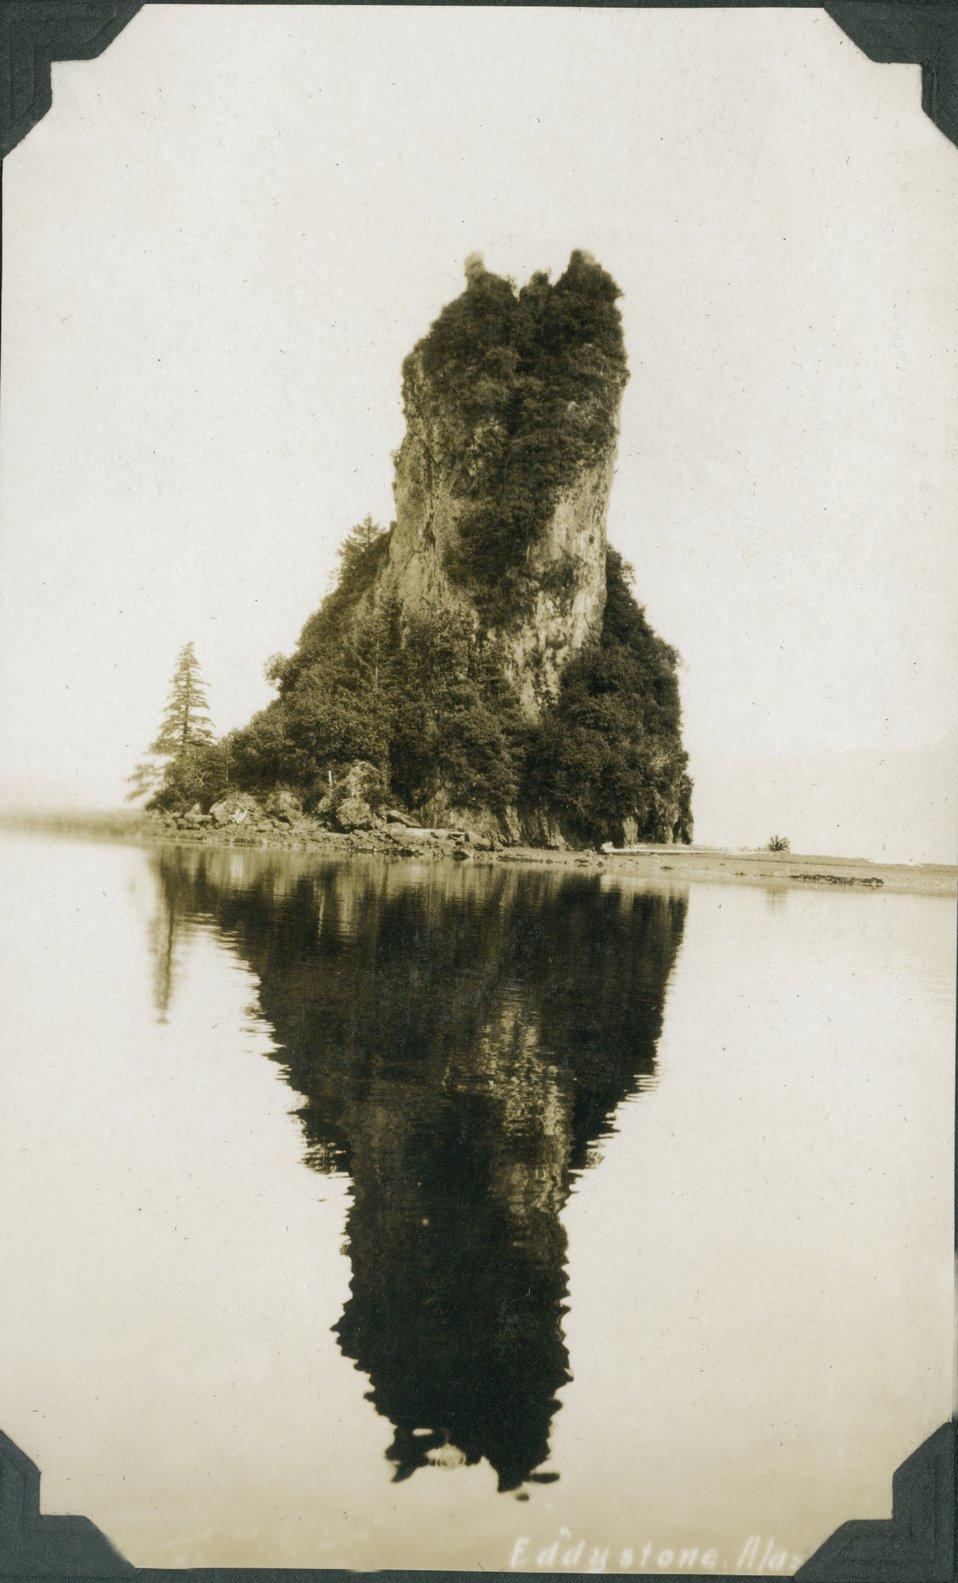 New Eddystone Rock, named for Eddystone Lighthouse.